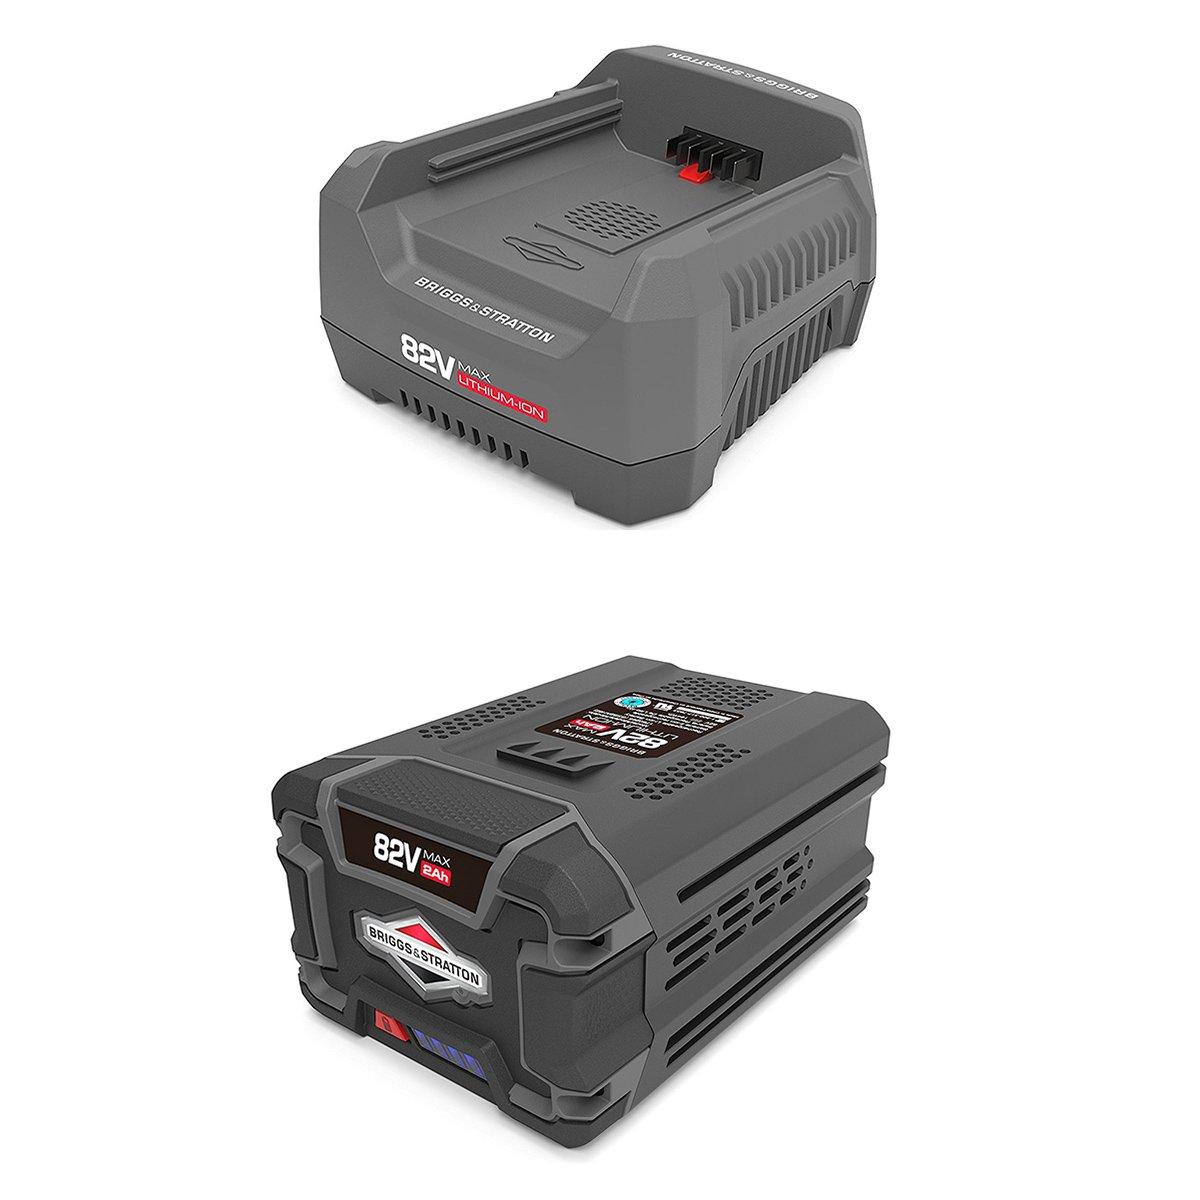 Snapper 82V Rapid Battery Charger + 82V Battery for Snapper XD Cordless Tools